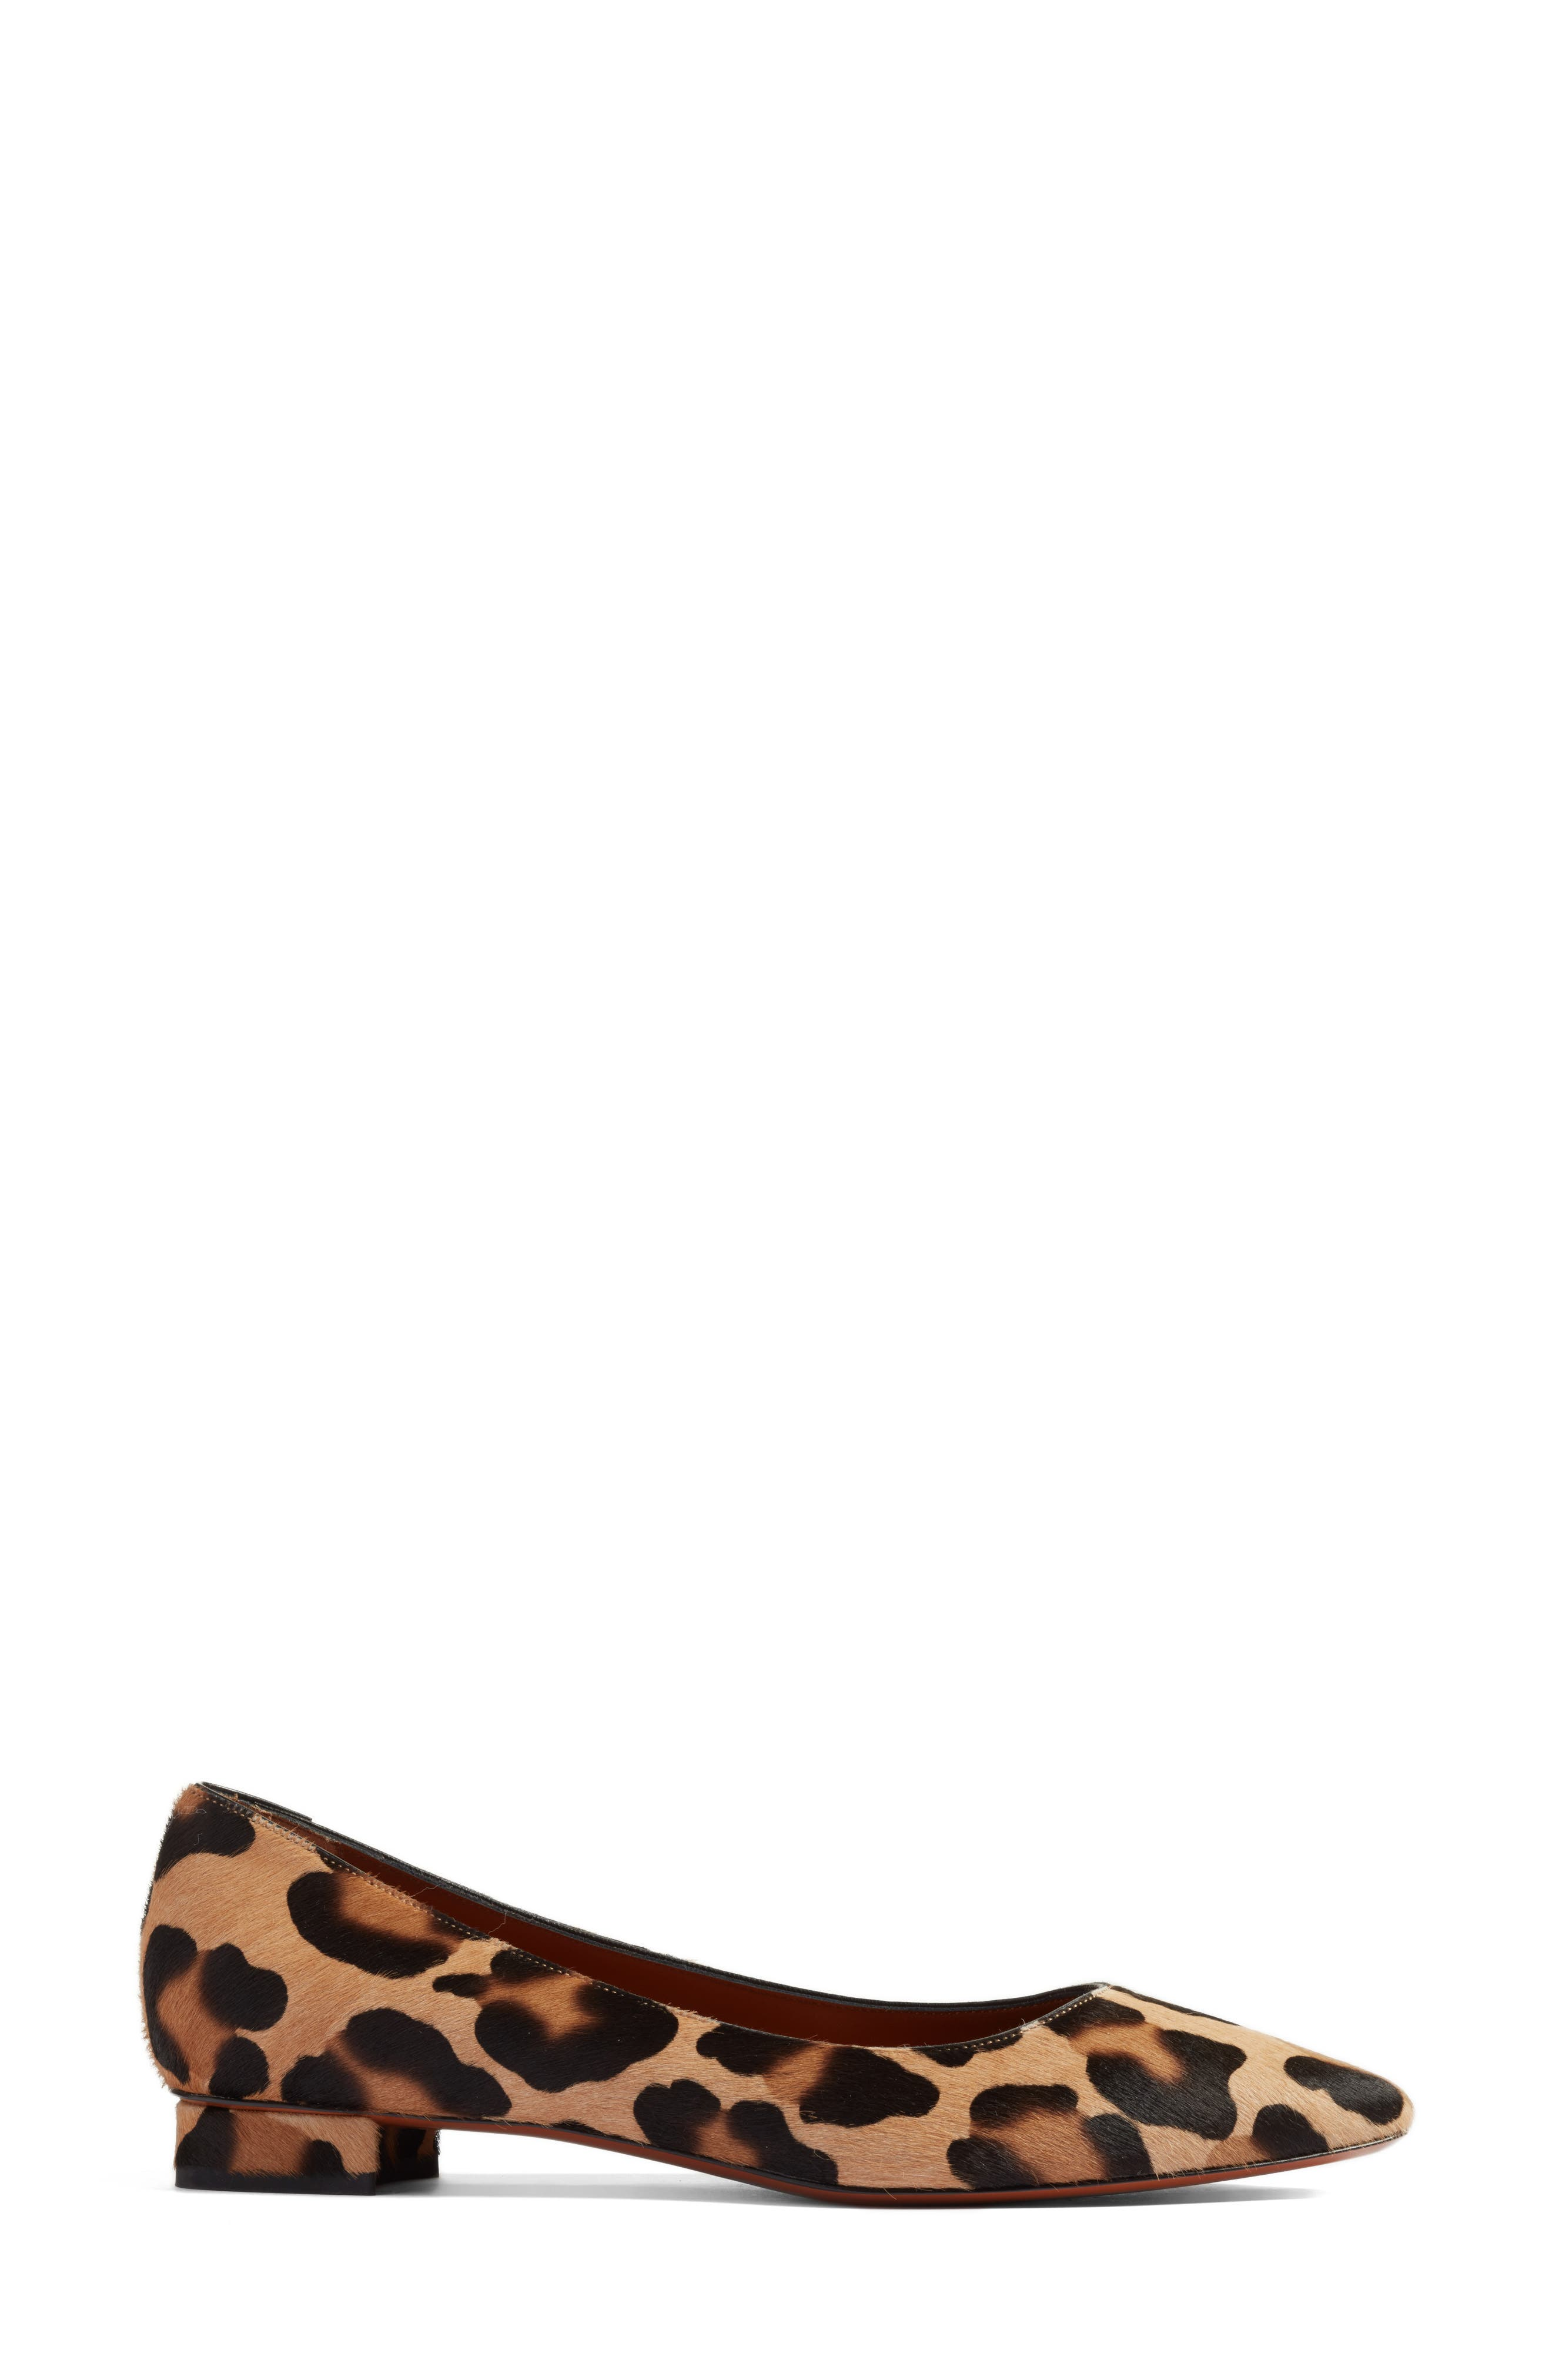 Alternate Image 3  - Aquatalia Perla Weatherproof Genuine Calf Hair Ballerina Shoe (Women)